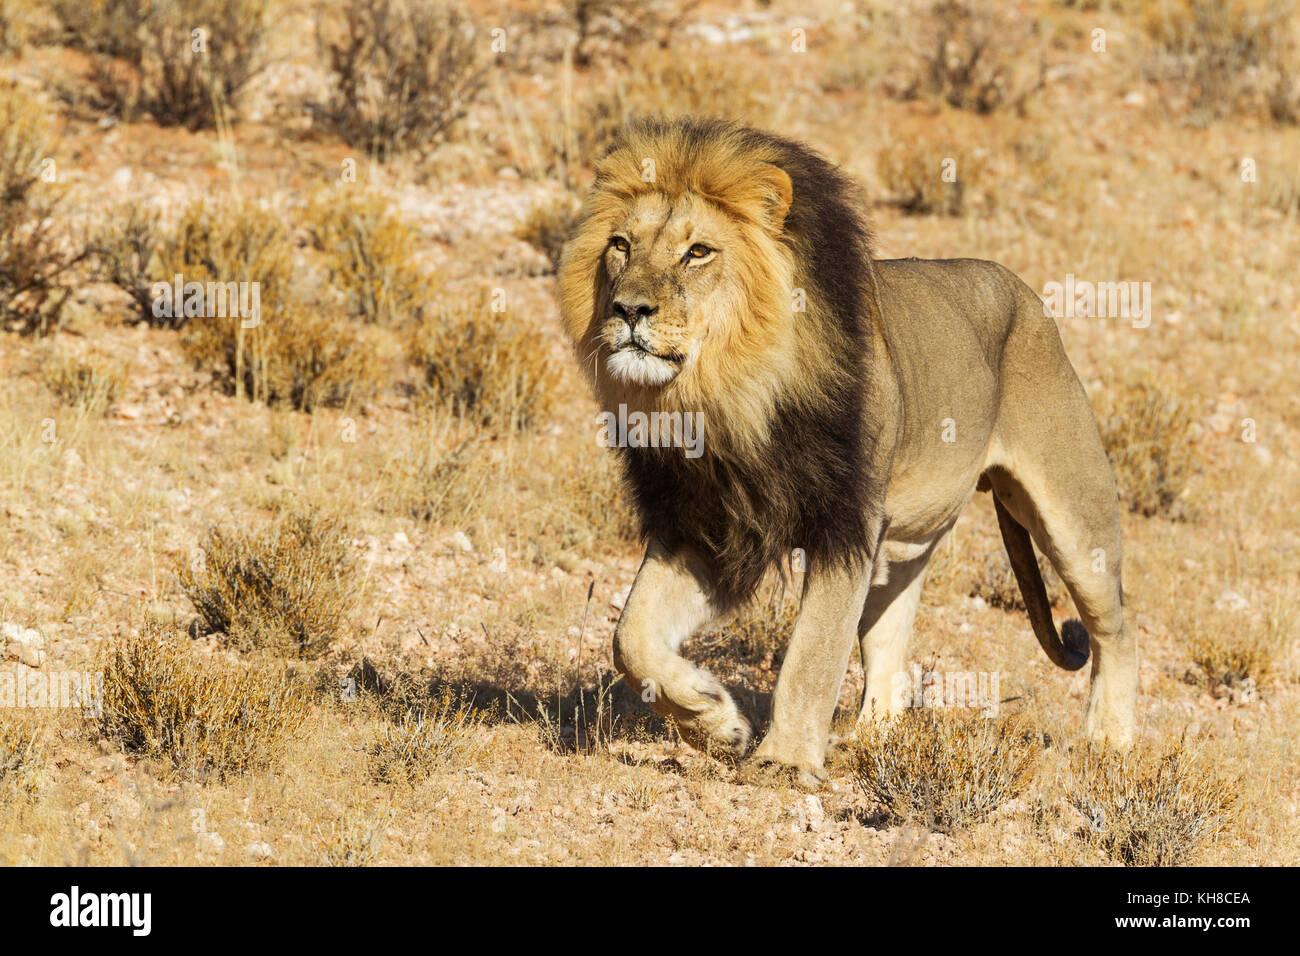 Negro-aguarï vernayi león (Panthera leo), macho, roaming, el desierto de Kalahari, el parque transfronterizo Imagen De Stock